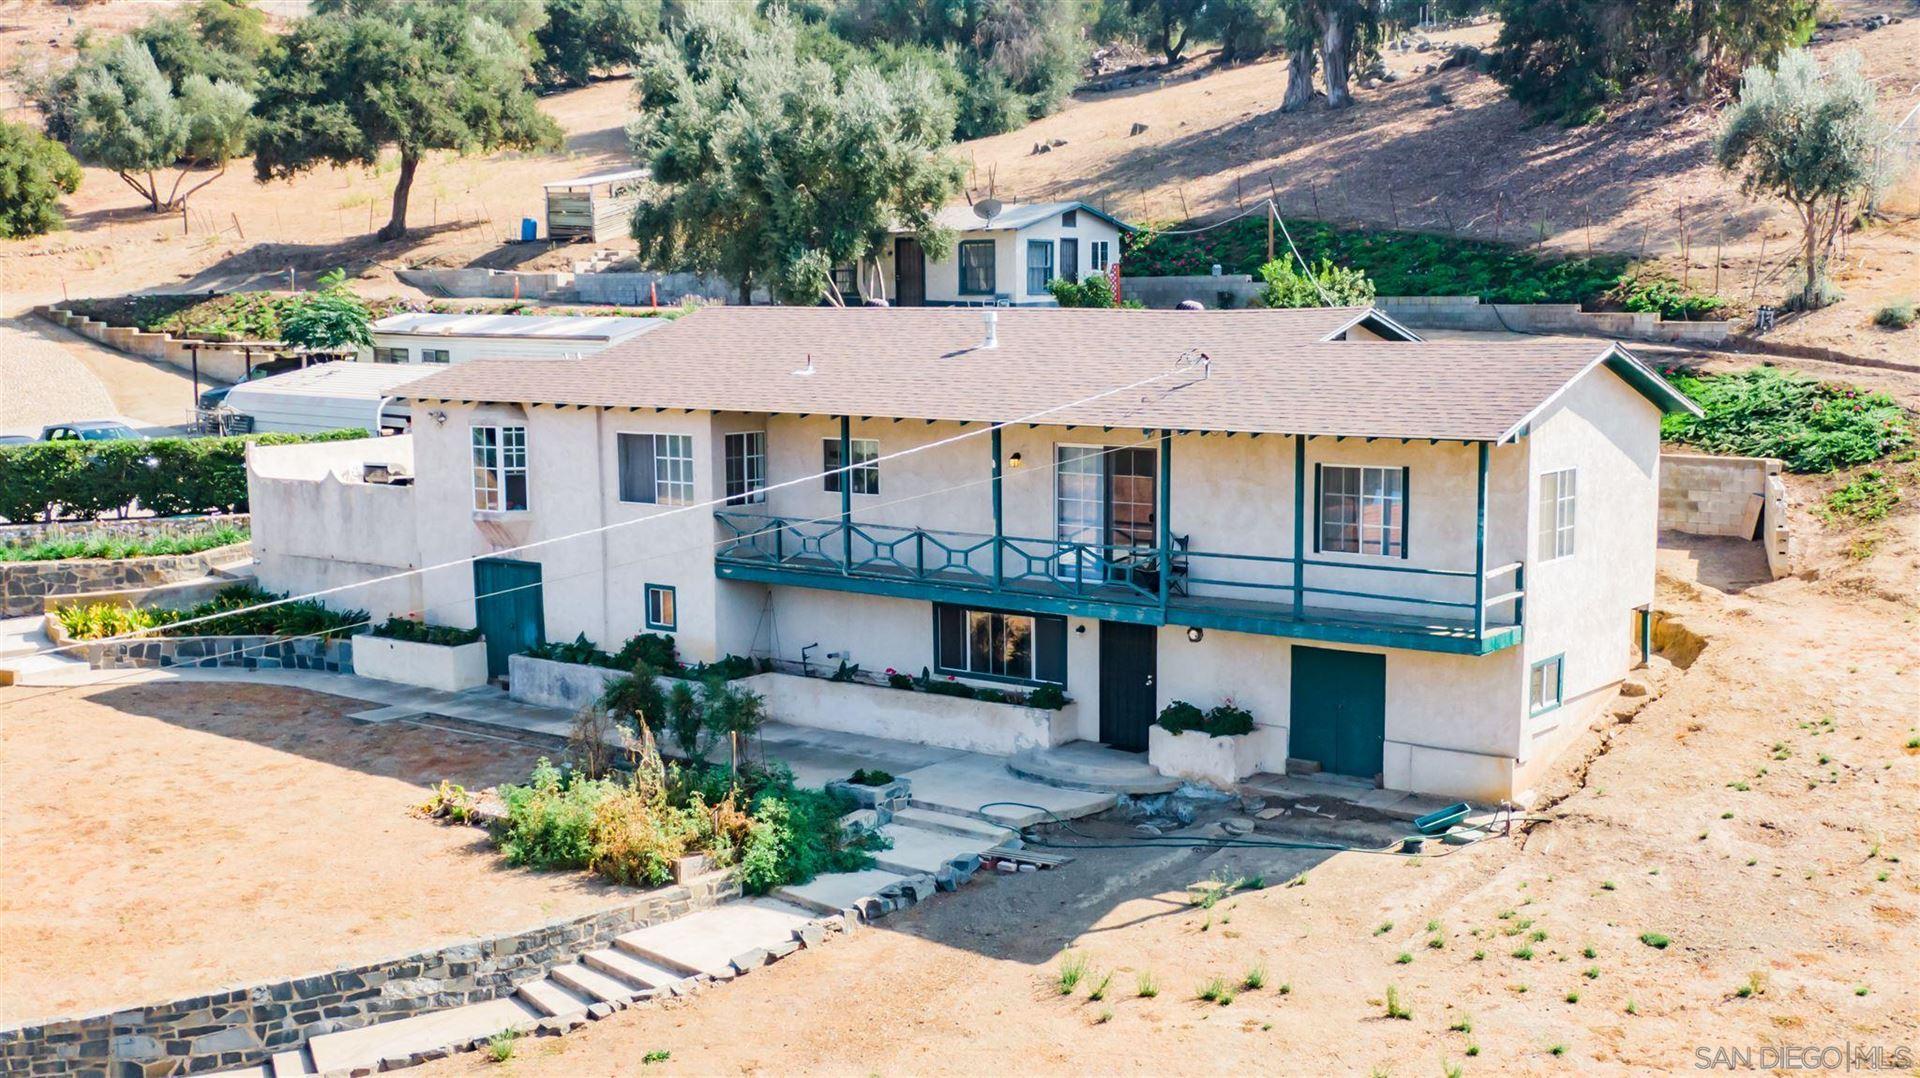 1776 Country Club Dr, Escondido, CA 92029 - MLS#: 200048847